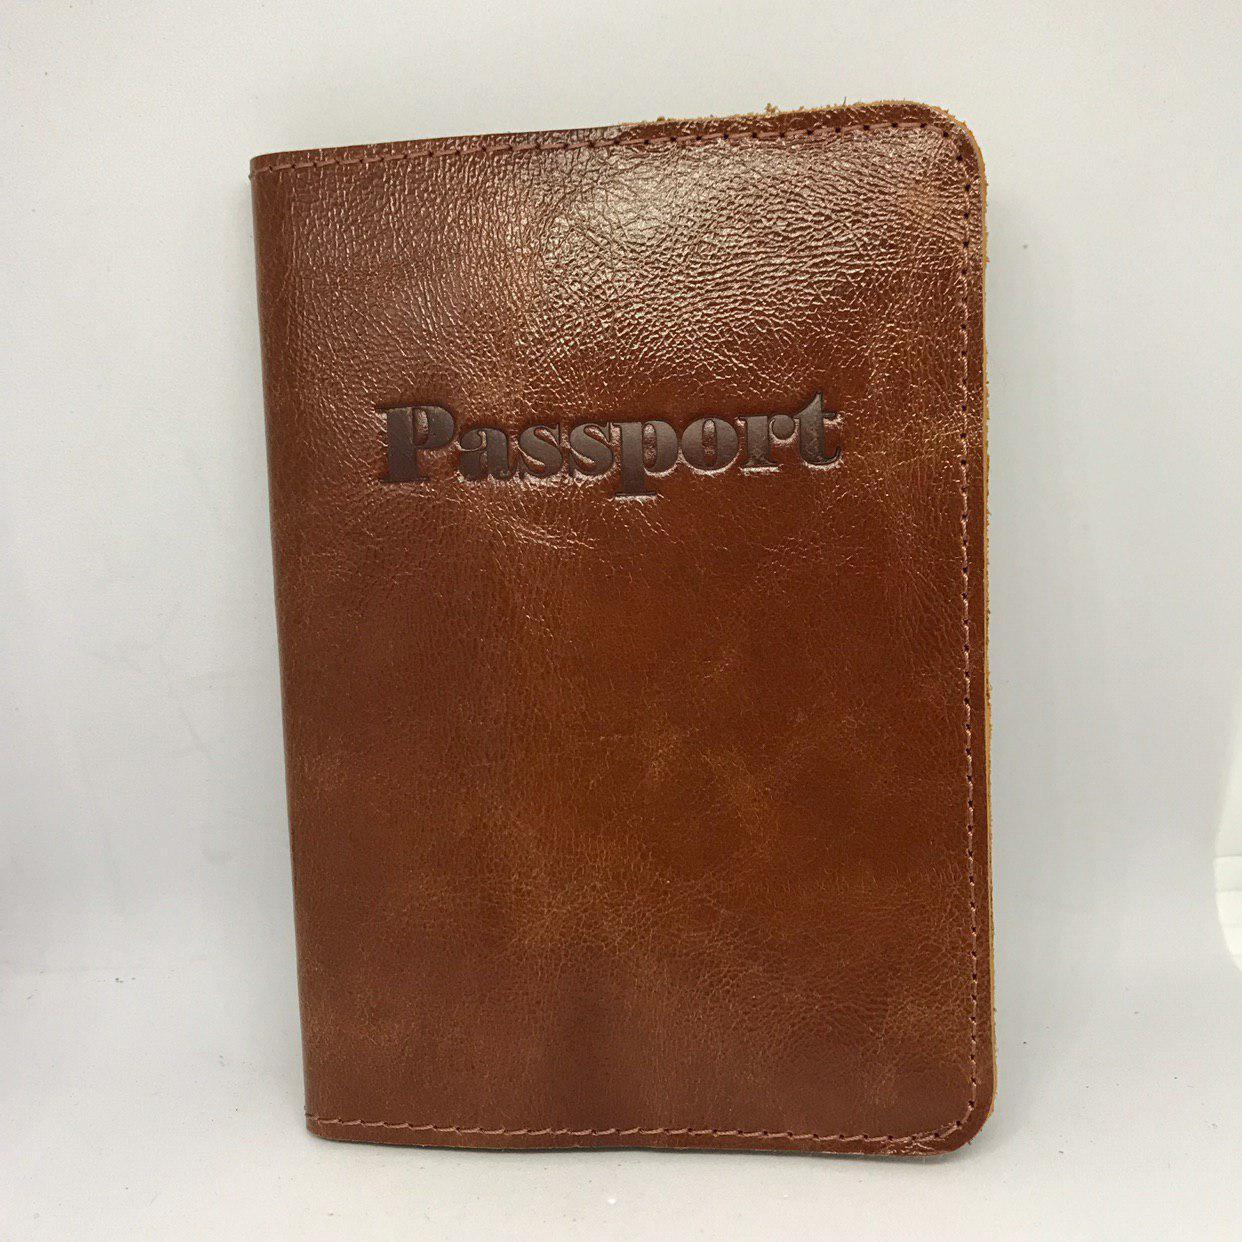 "Обкладинка на паспорт шкіряна ""Vip"", v.1.0 алькор дерево, Обложка для паспорта кожаная ""Vip"""